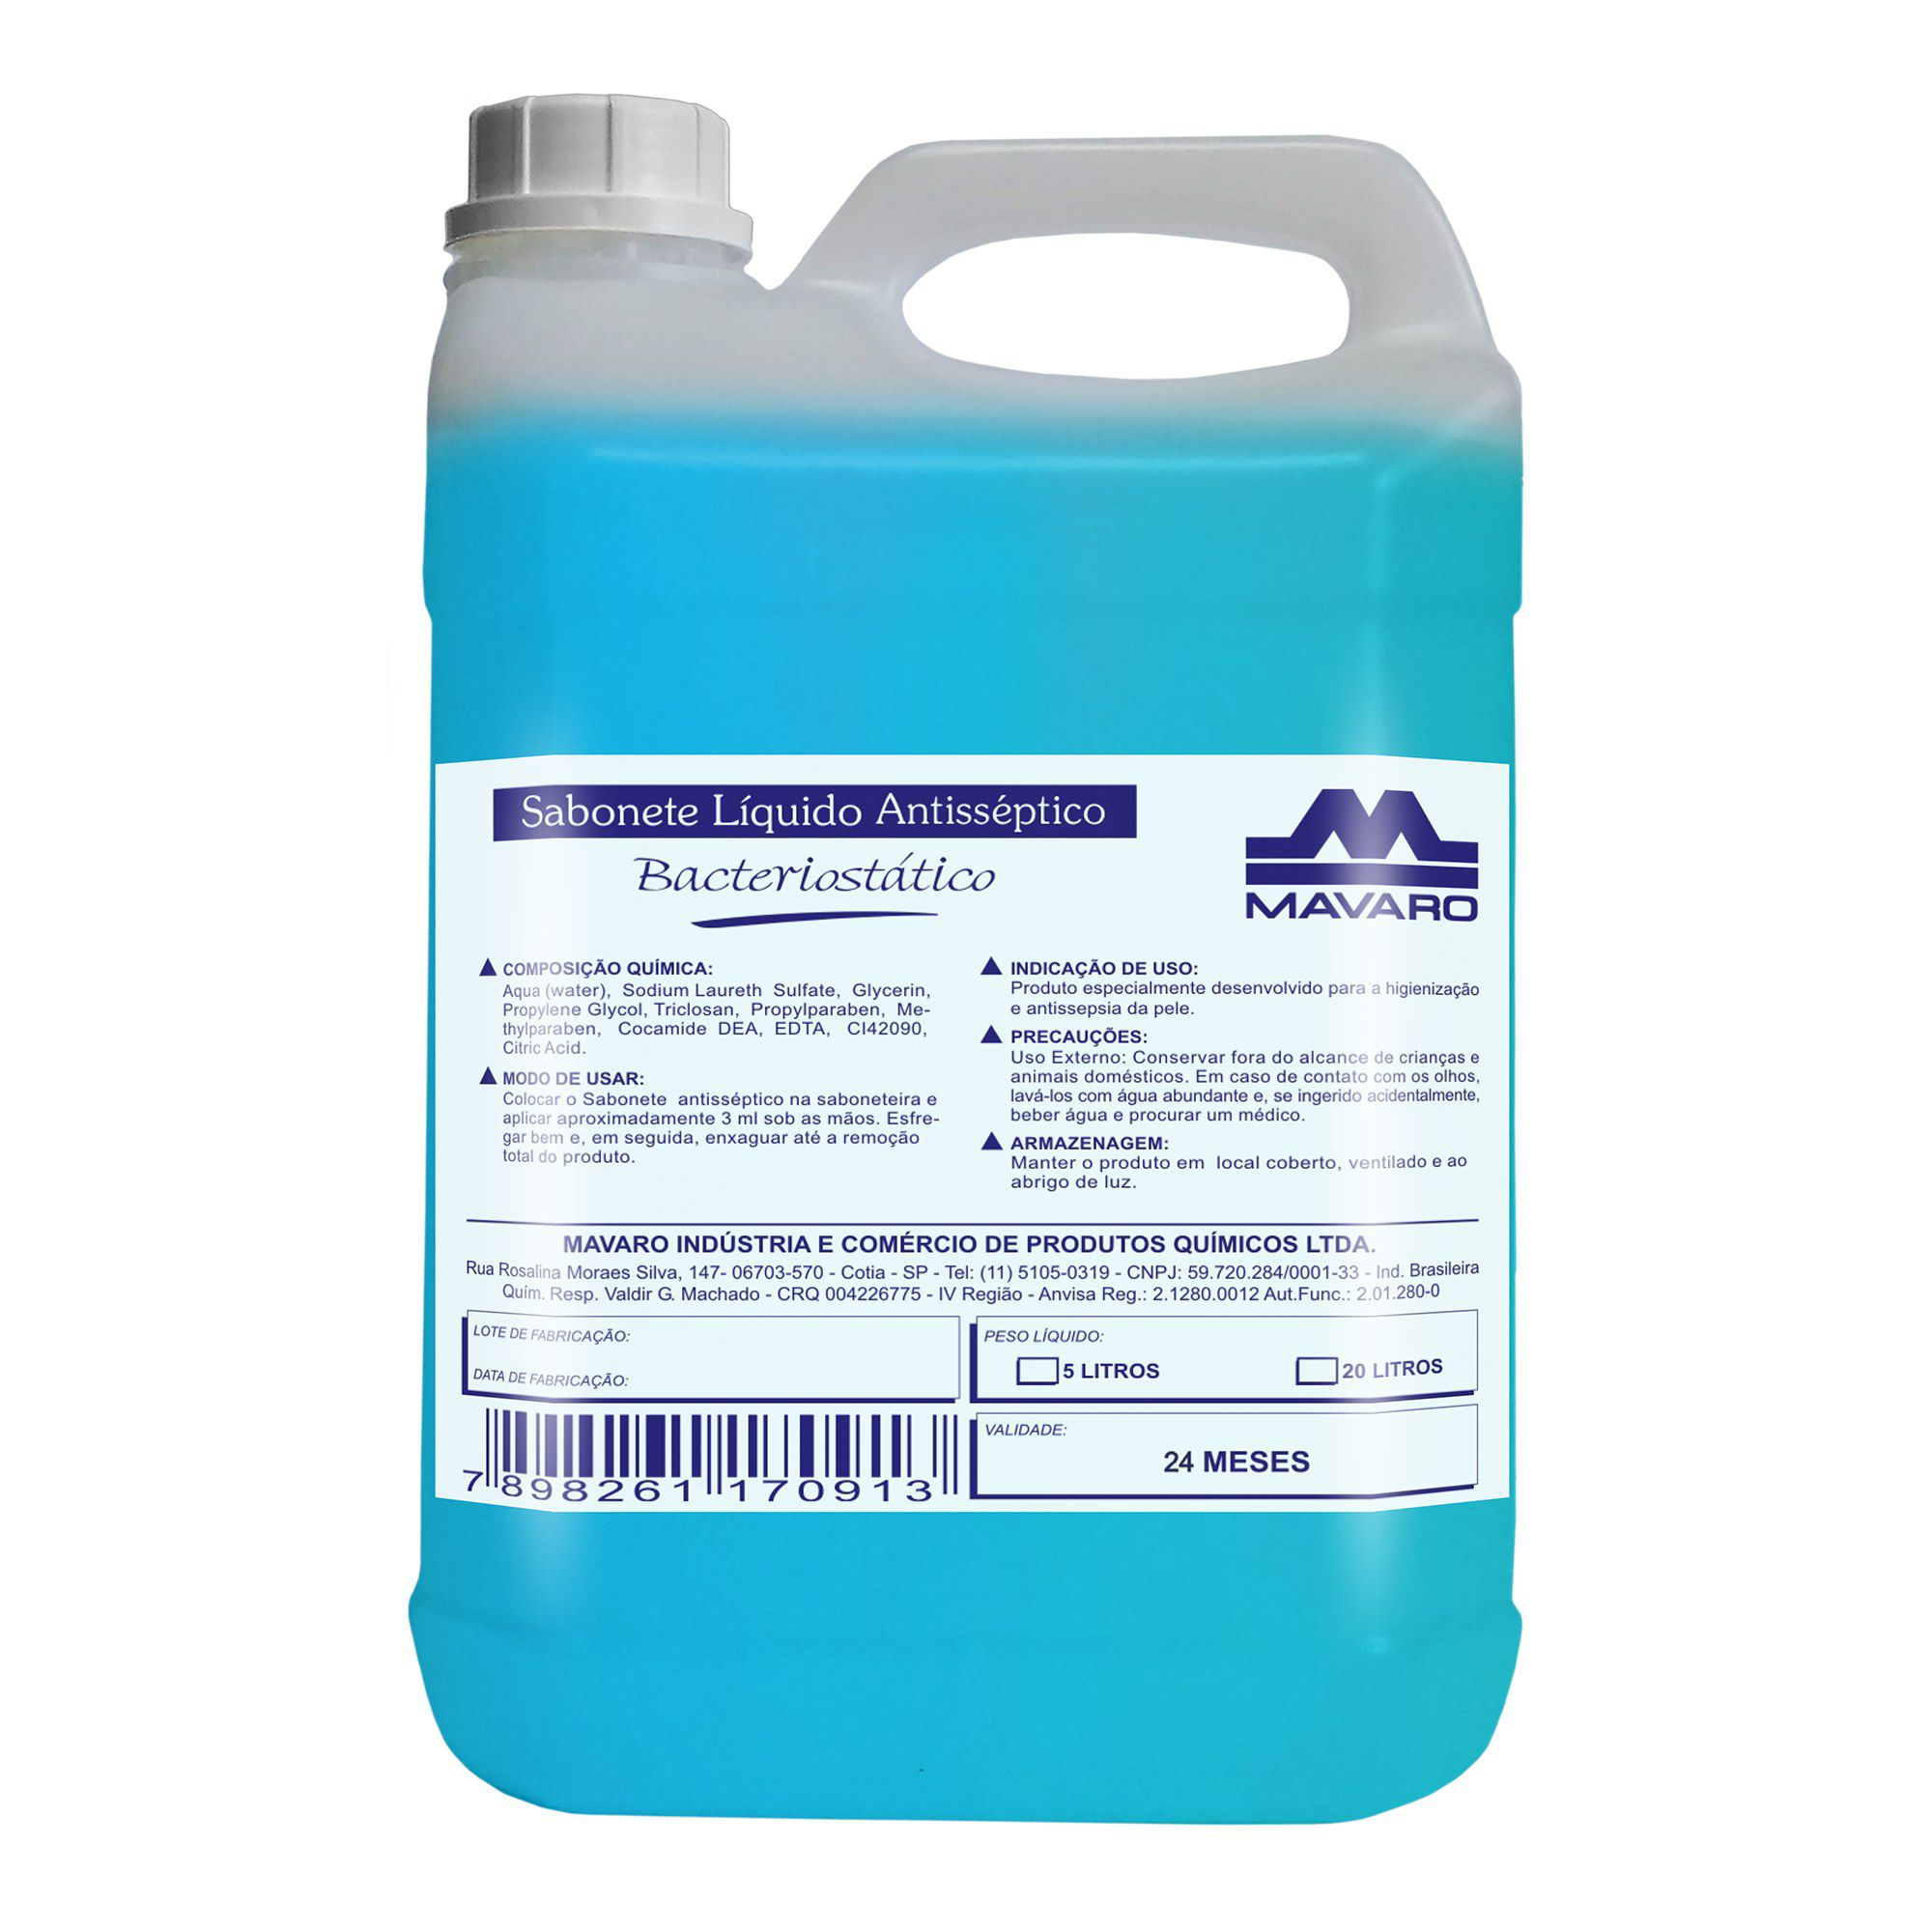 Sabonete líquido Antisséptico Bacteriostático 5l